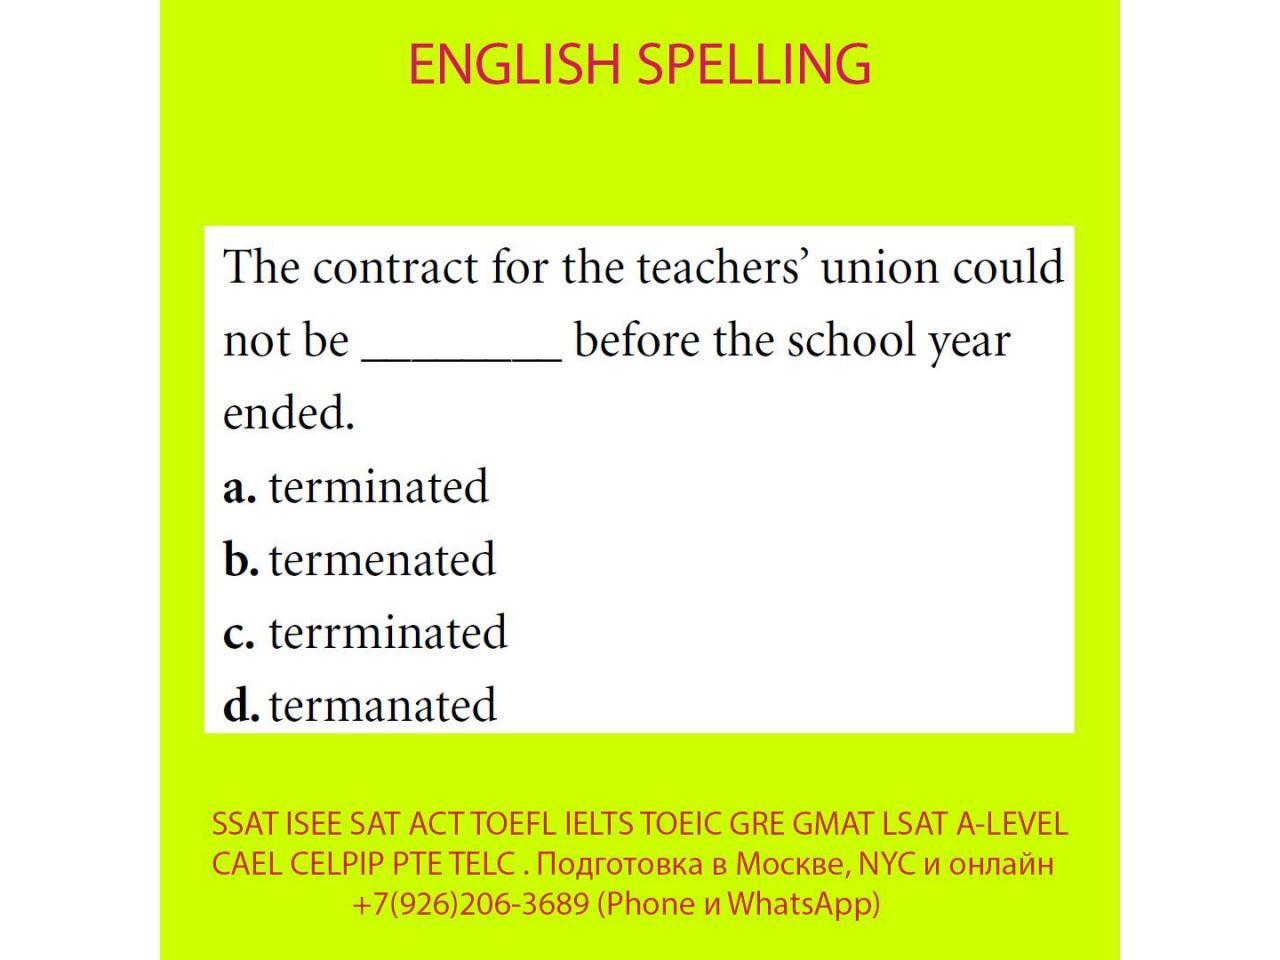 Подготовка к SSAT ISEE SAT ACT TOEFL IELTS TOEIC GRE GMAT LSAT A-LEVEL BEC CAEL CELPIP PTE TELC - 12